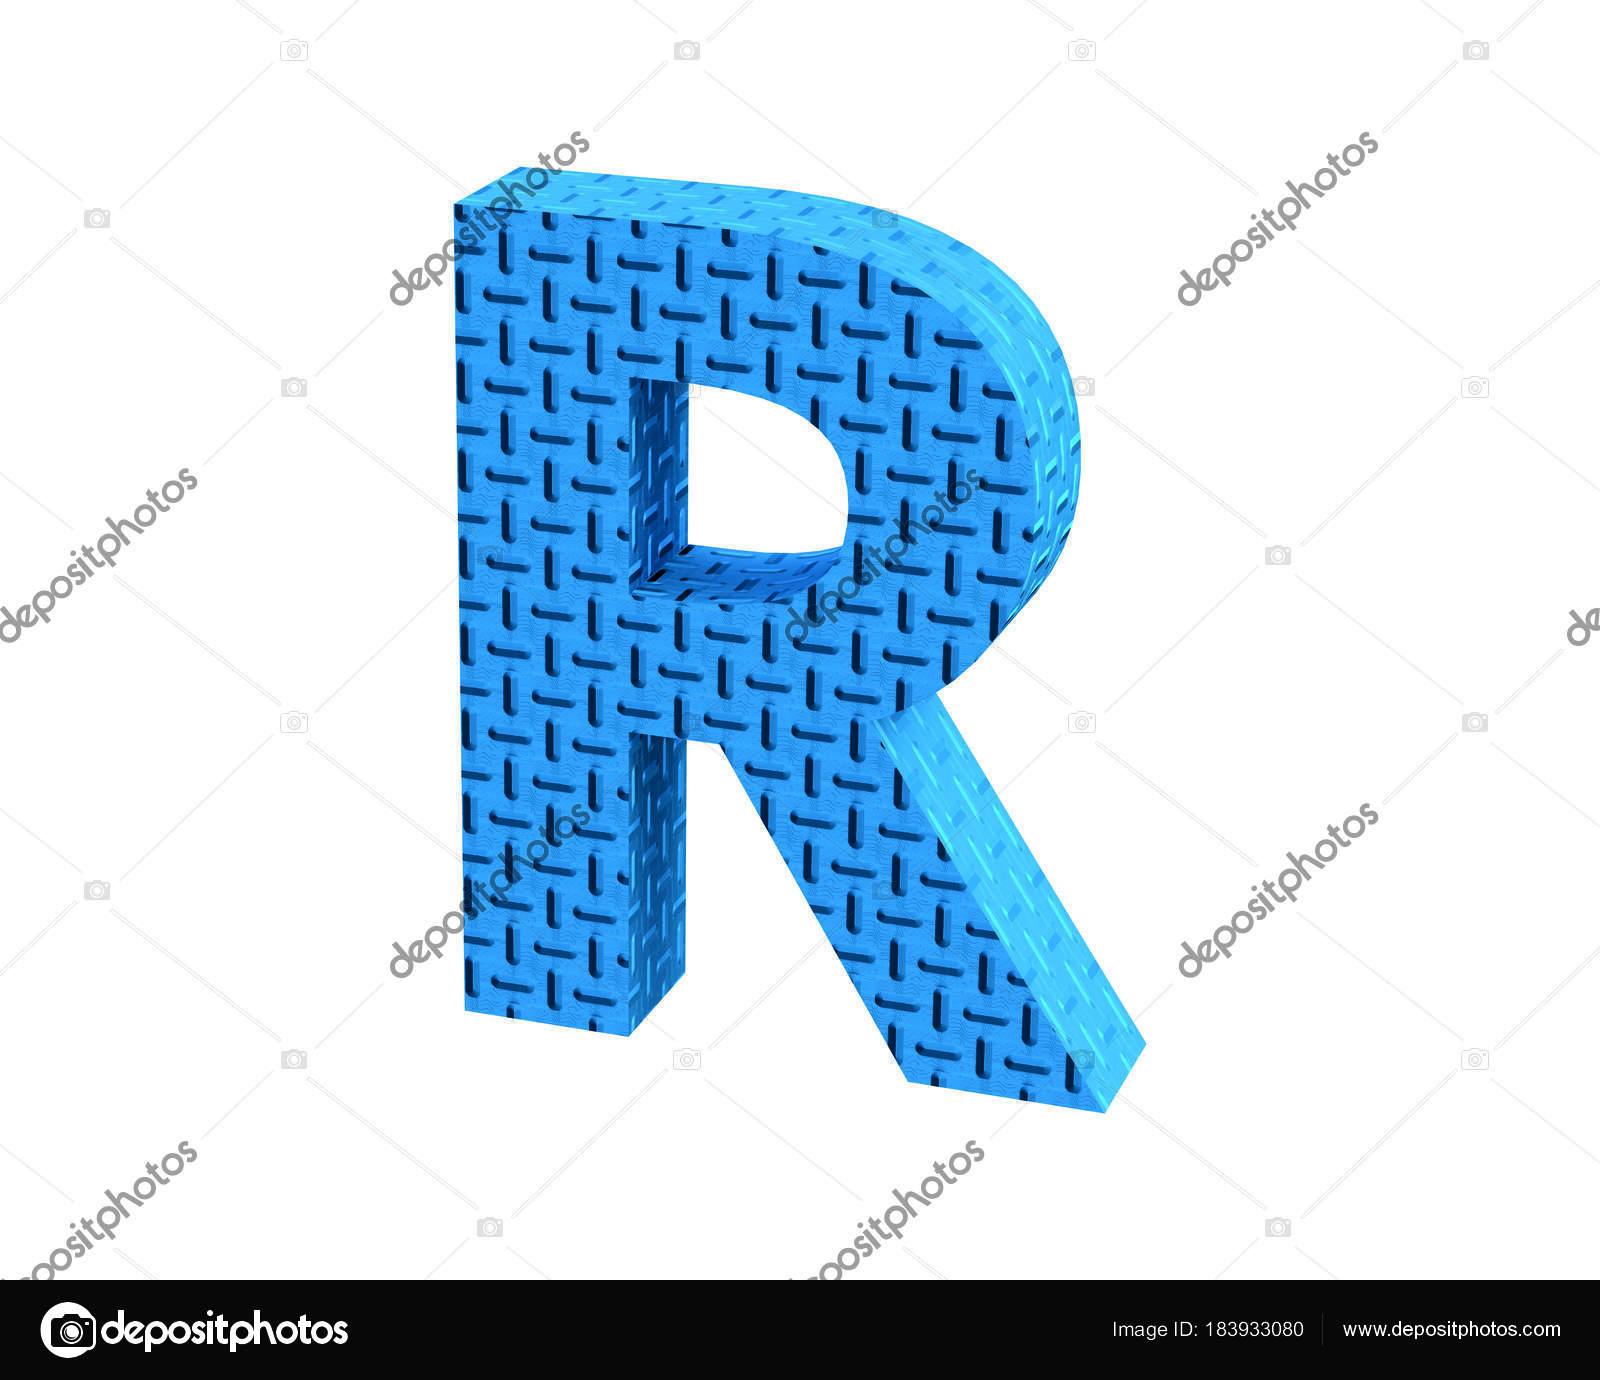 3D rendering Font Plastic blue treadplate capital R u2014 Photo by dhz-ontwerpen@hotmail.com  sc 1 st  Depositphotos & Font Plastic blue treadplate capital R render u2014 Stock Photo © dhz ...